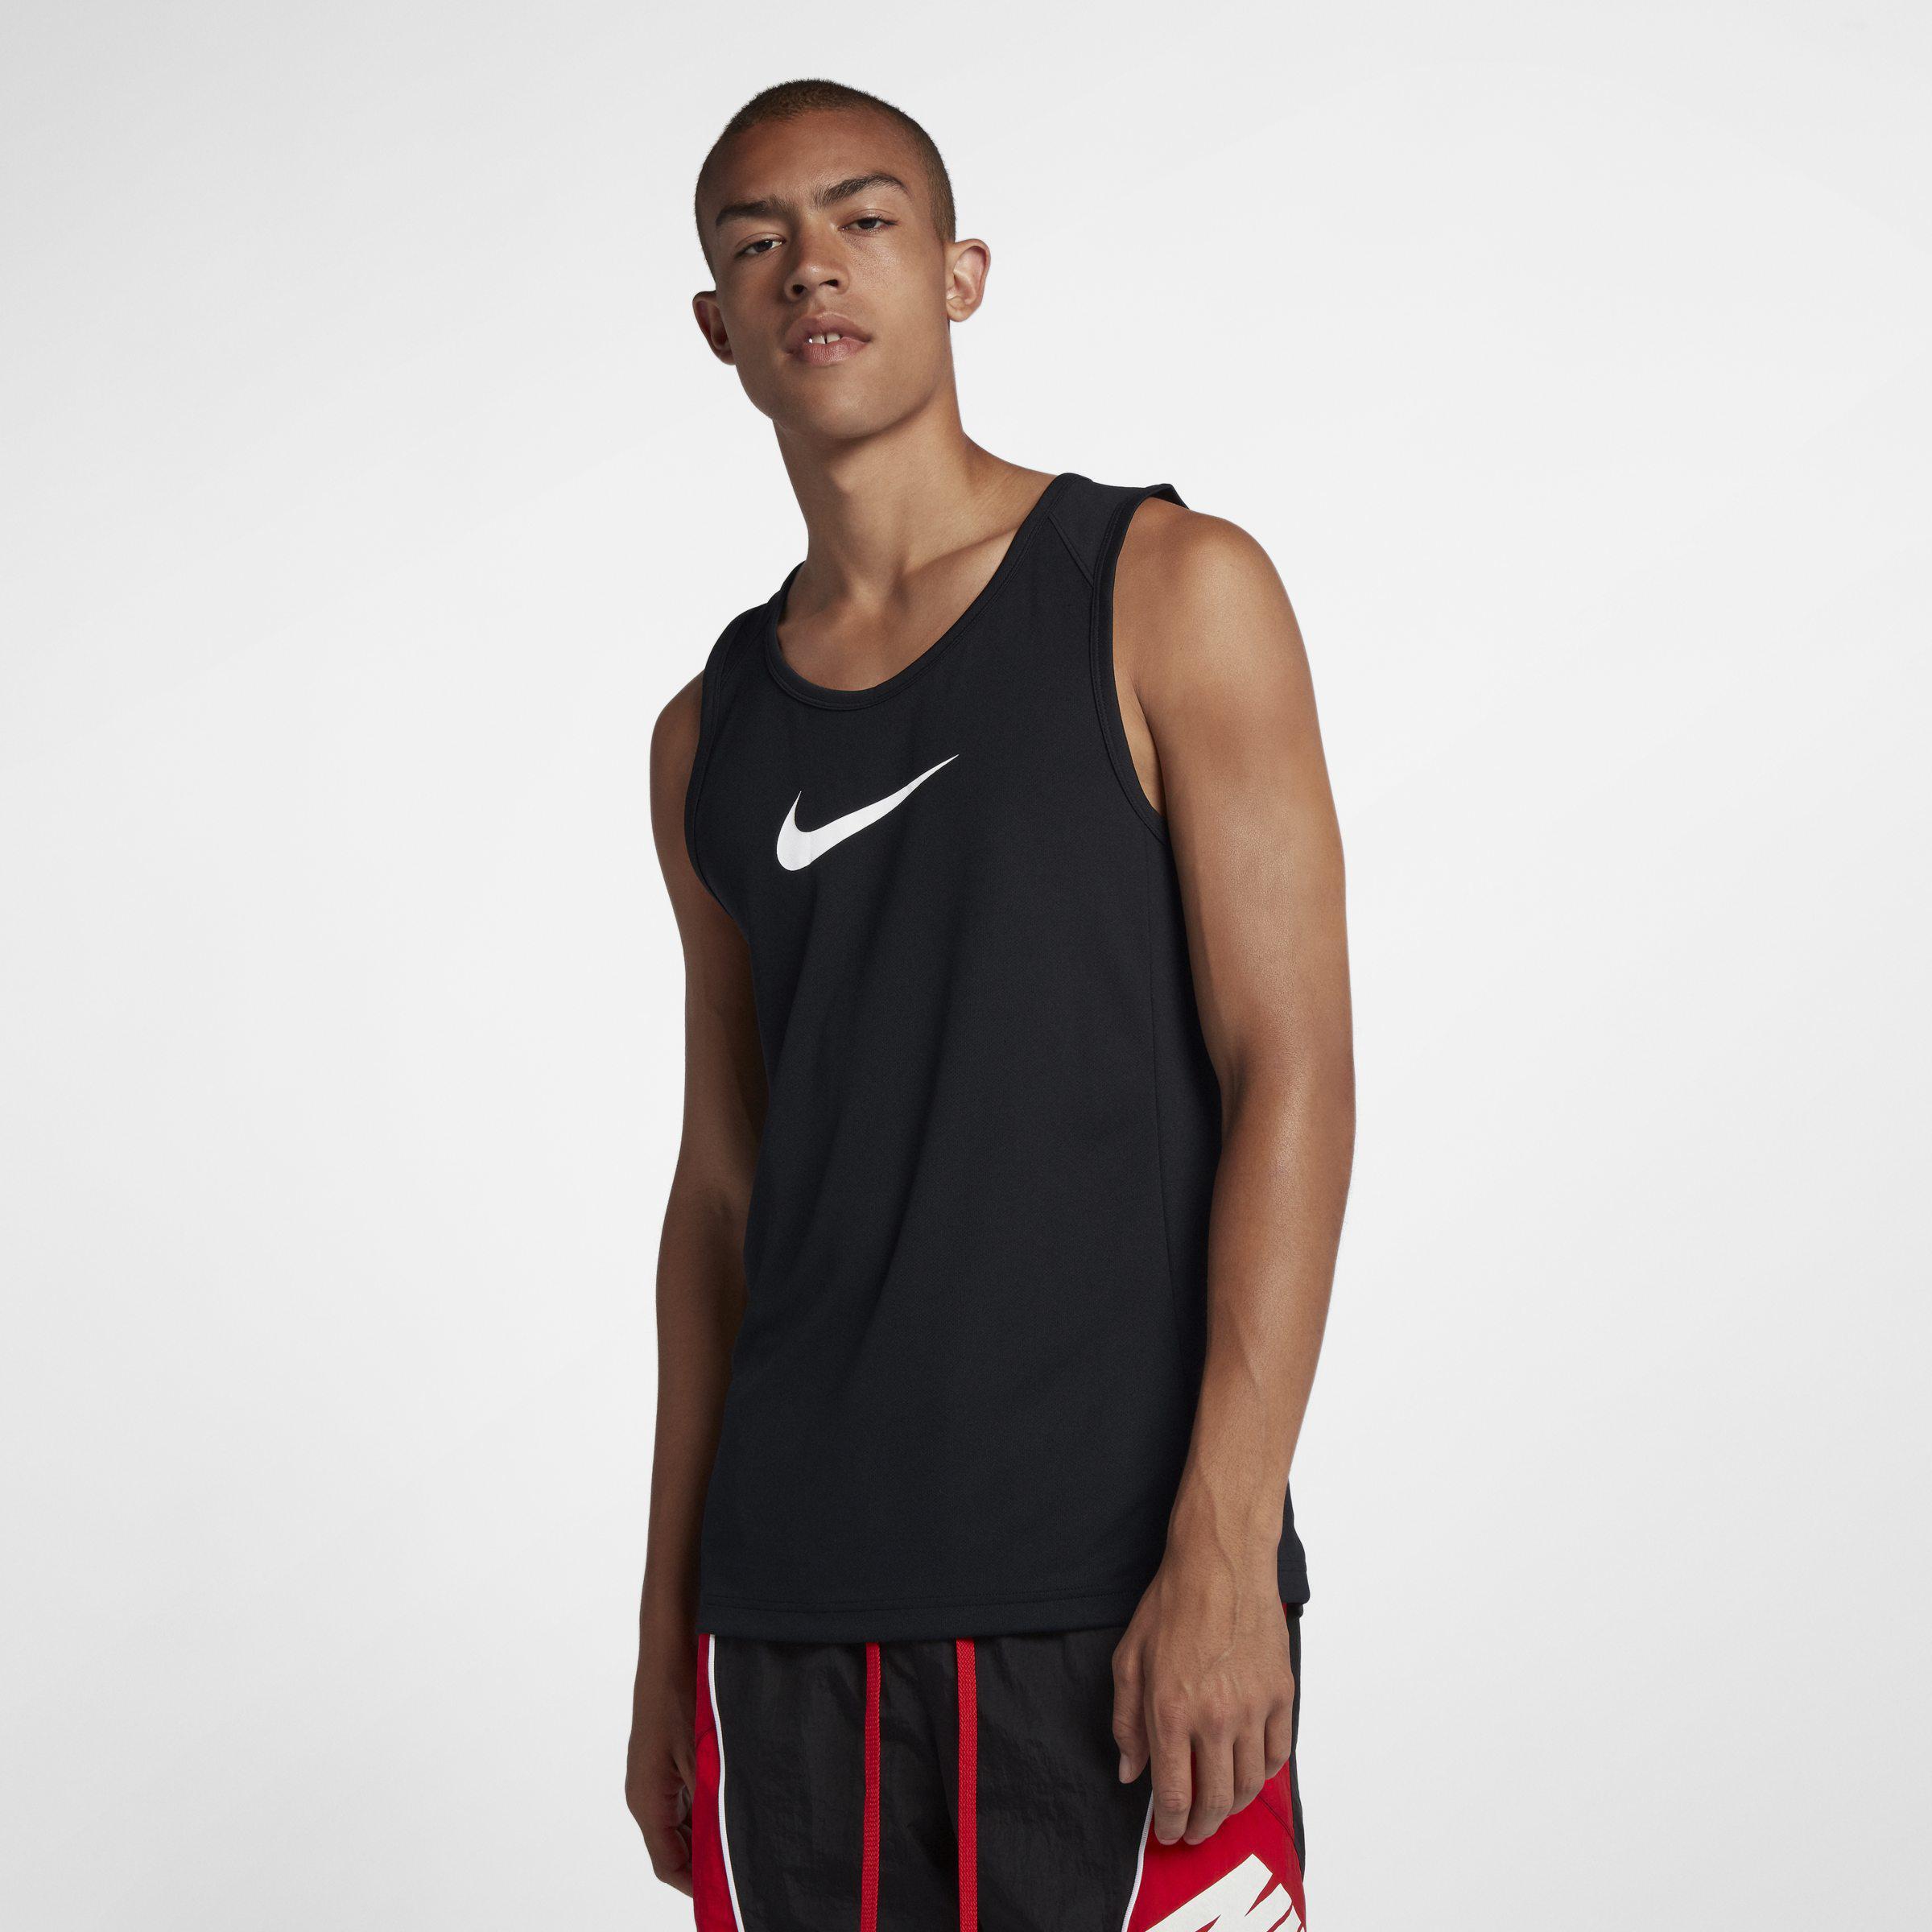 437cb18b28a95 Nike Dri-fit Basketball Tank in Black for Men - Save 26% - Lyst